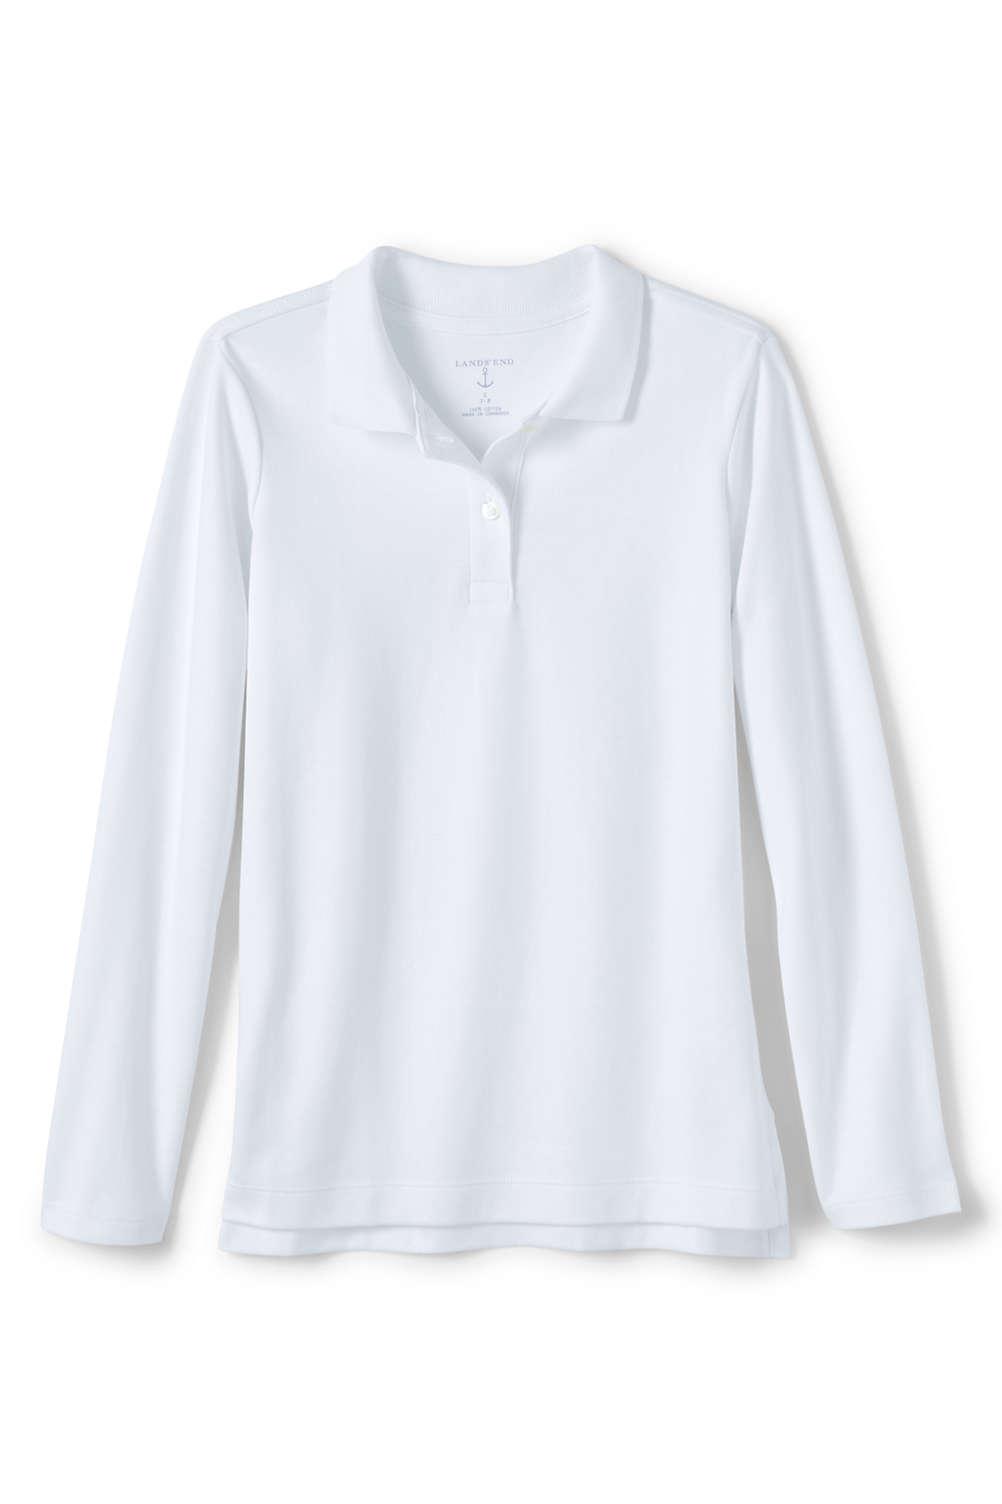 05995896001167 Girls Long Sleeve Feminine Fit Interlock Polo Shirt from Lands' End